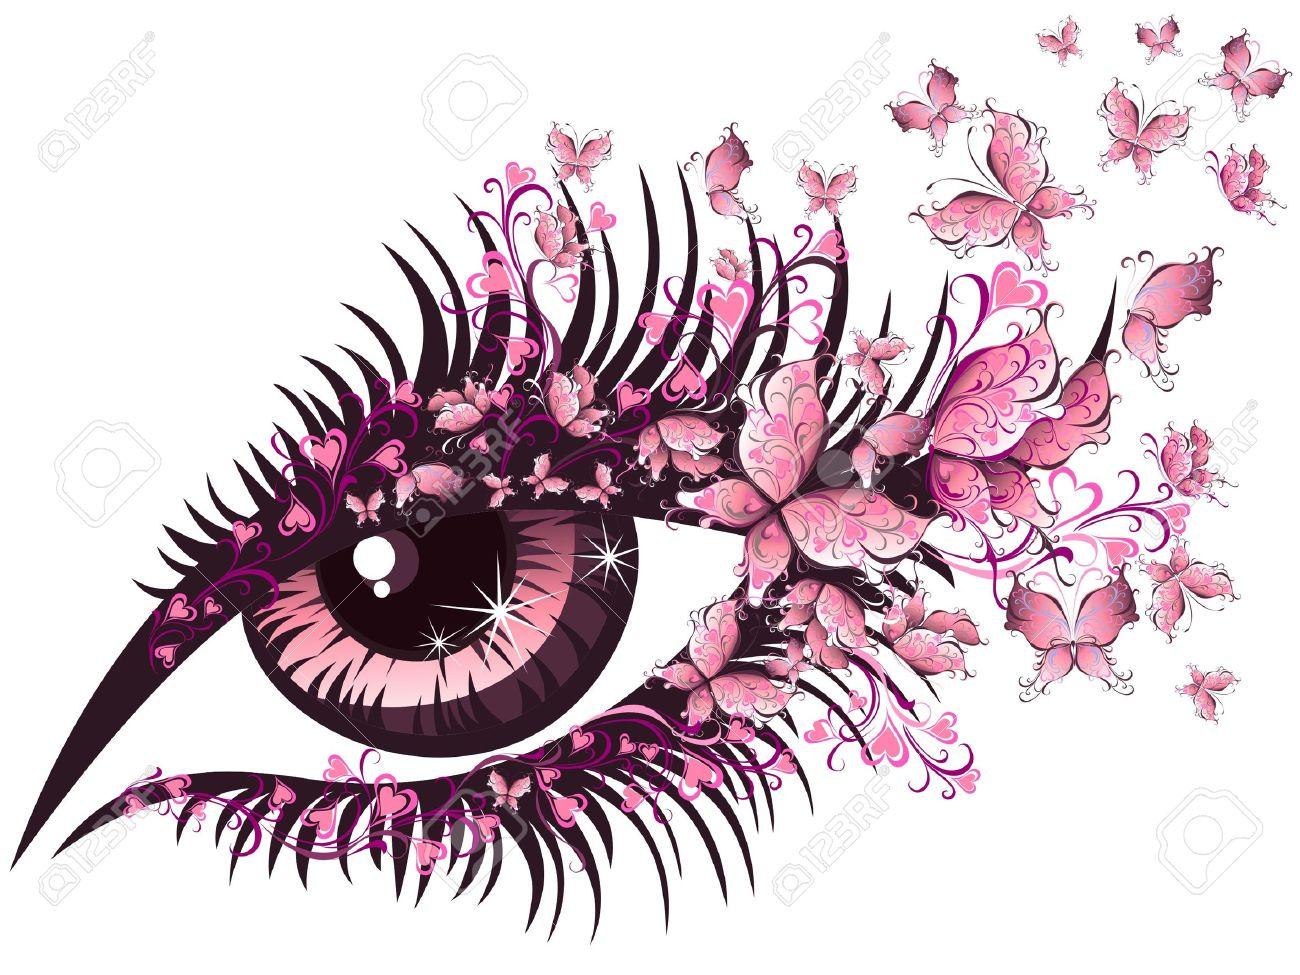 Beautiful female eye with butterflies - 16389284